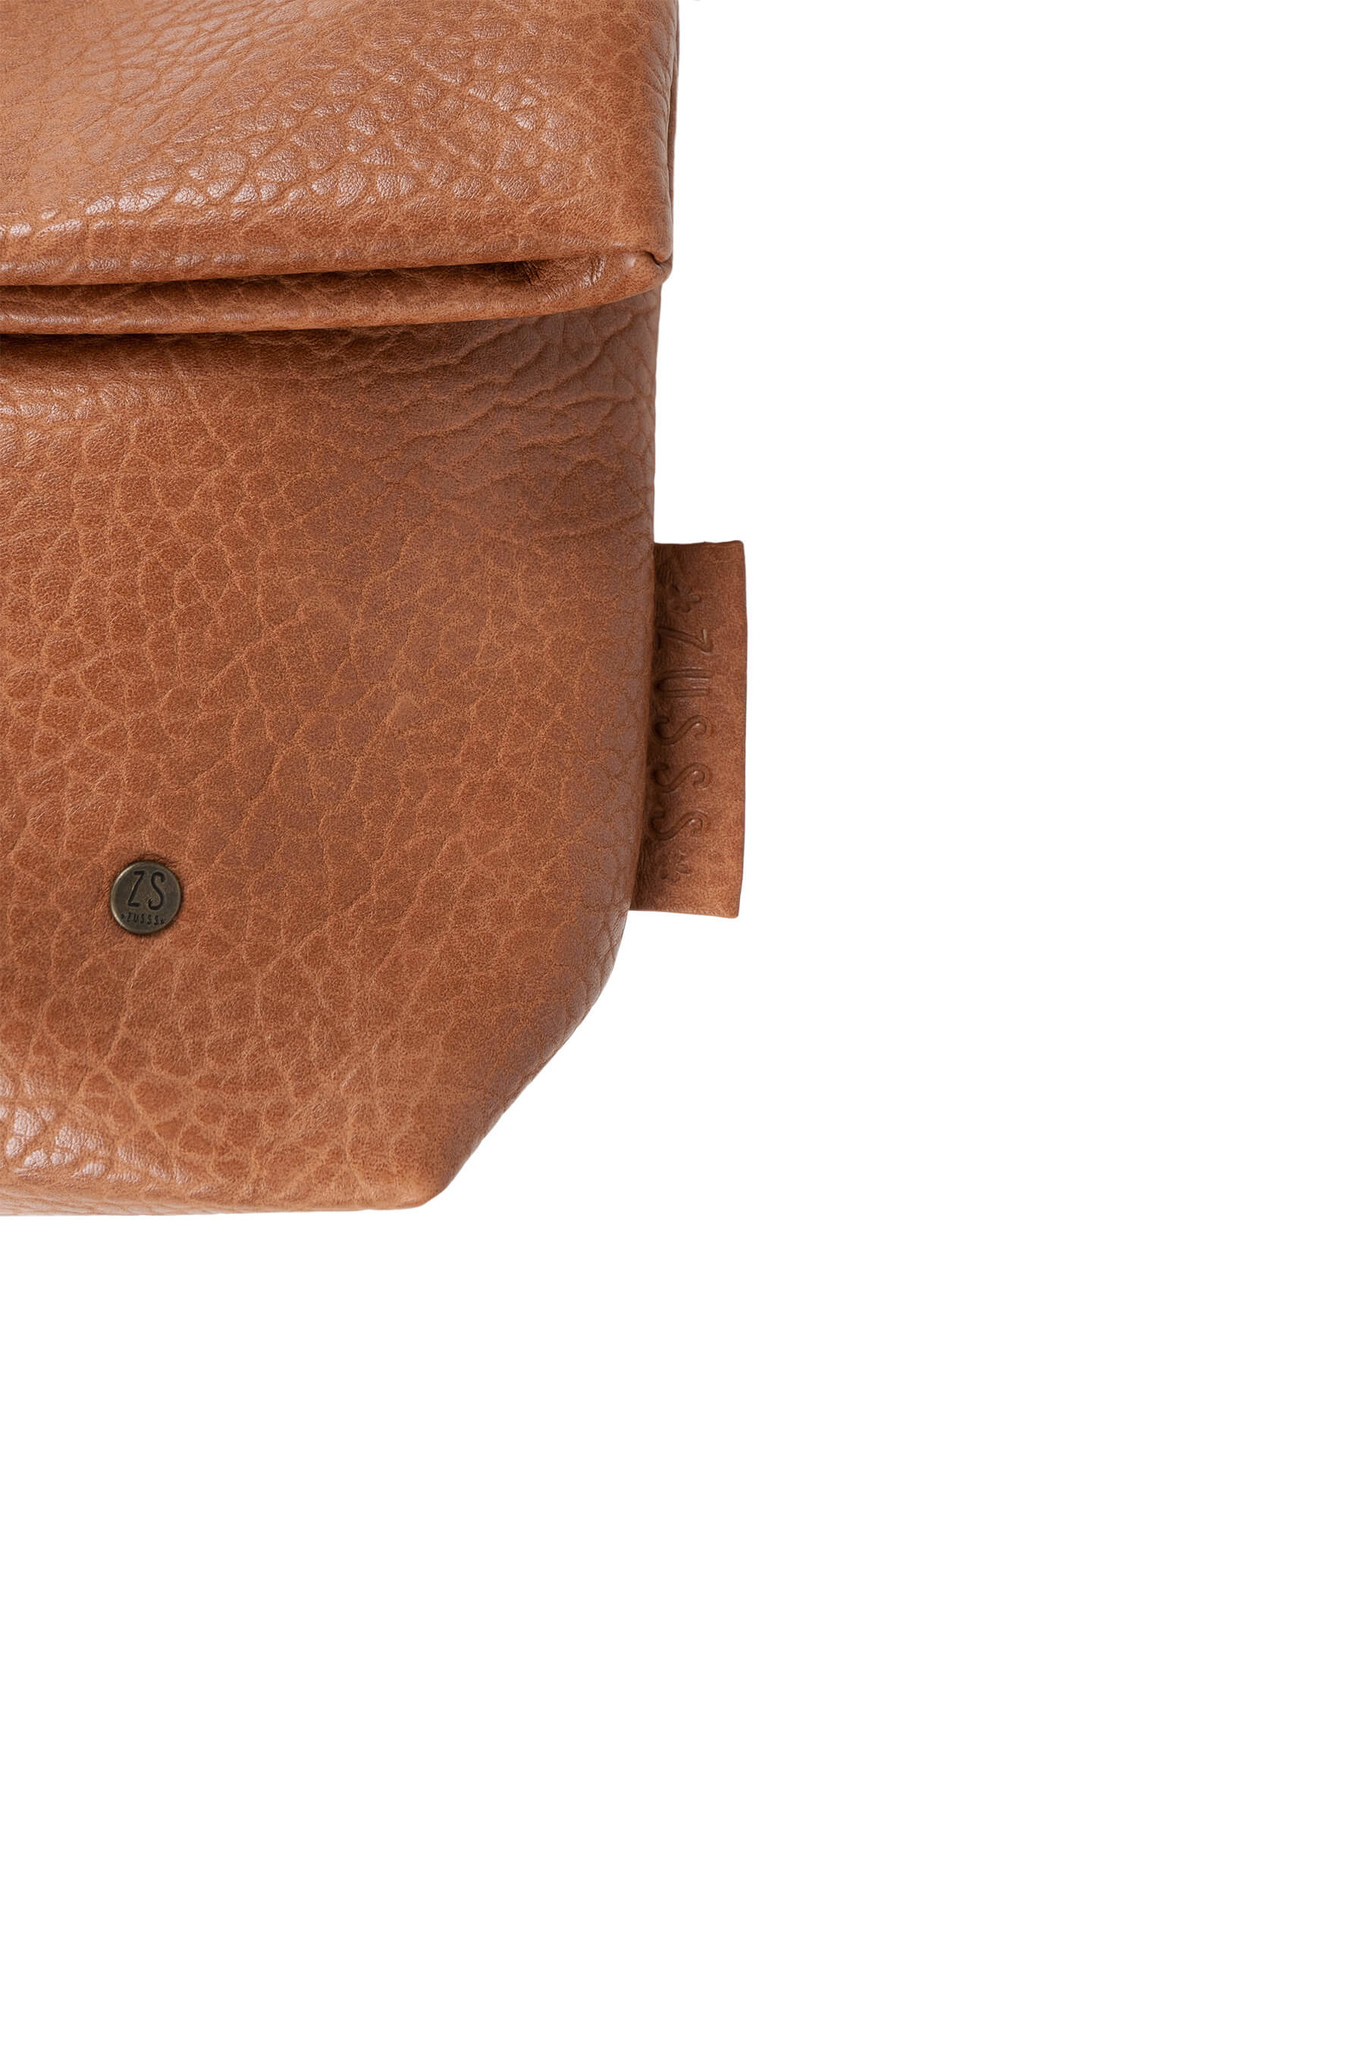 Zusss Basic shoudertas M - bruin gevlokt